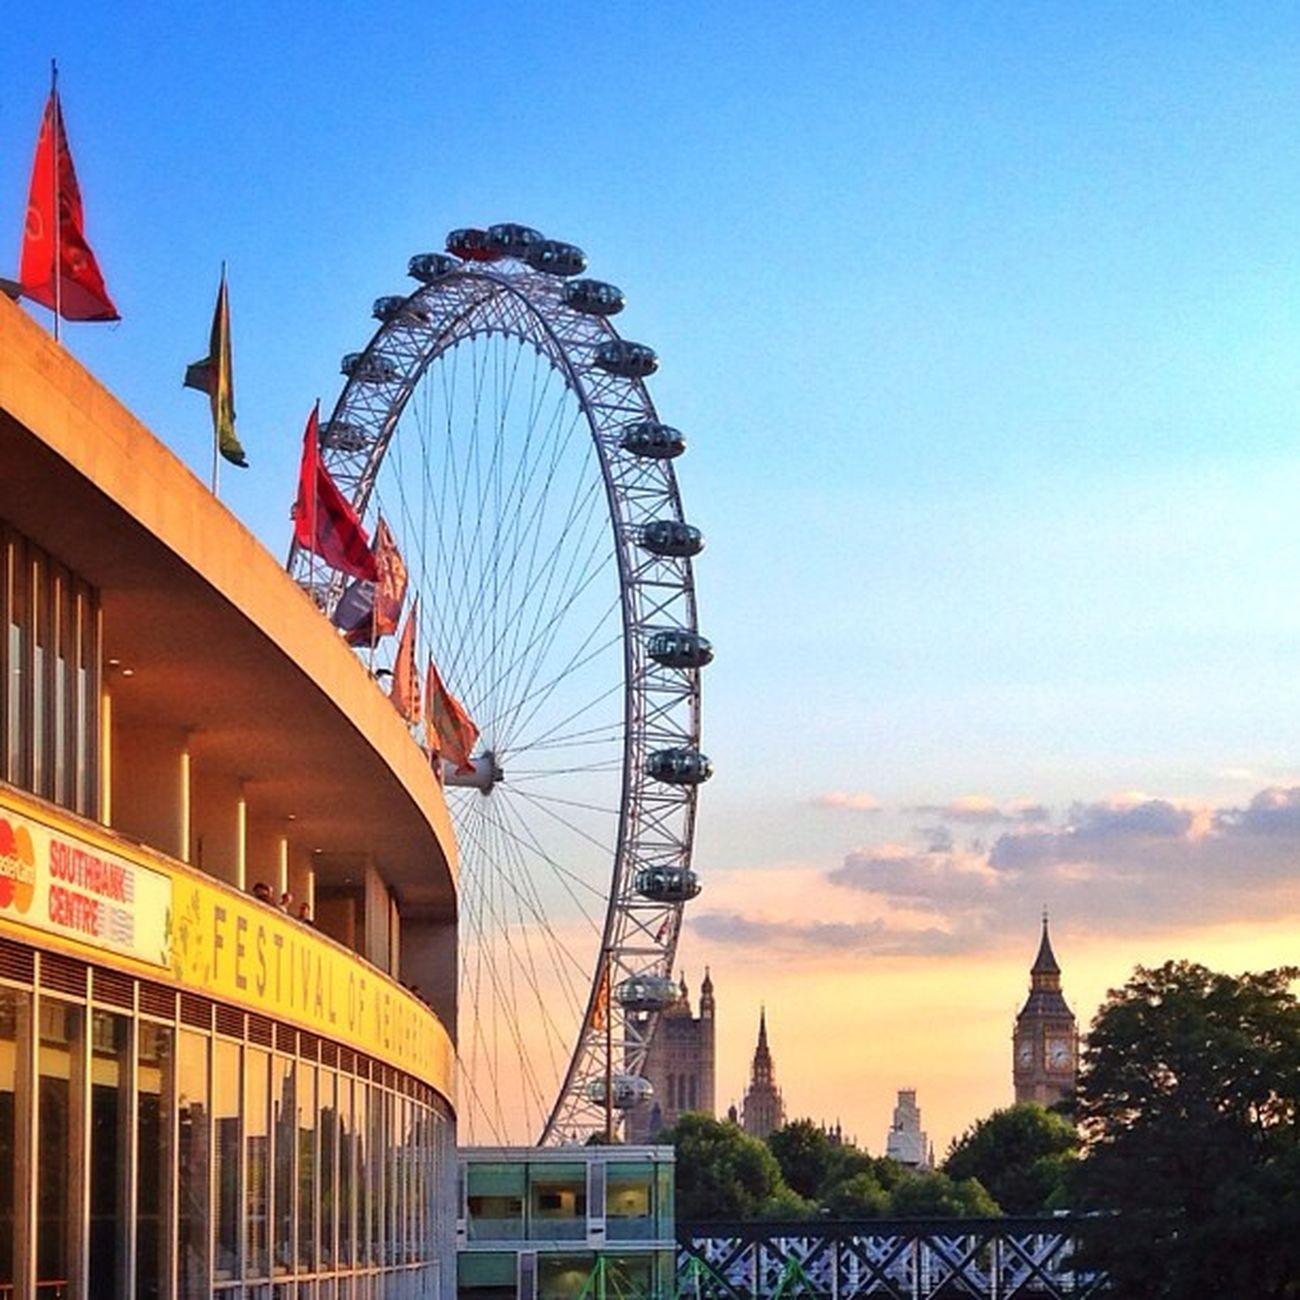 BigBen & London Eye from #southbank ☀️???????☀️#bigben #londoneye #alan_in_london #gf_uk #gang_family #igers_london #insta_london #london_only #thisislondon #from_city #ic_cities_london #ig_england #love_london #gi_uk #ig_london #londonpop #allshots_ #a Insta_london Thisislondon Sunset Gi_uk Igers_london Ig_england LondonEye Love_london Southbank Ic_cities_london Ig_london Bigben Aauk Gang_family Capture_today Londonpop Loveyoursummer Allshots_ Mashpics London_only Top_masters Stunning_shots From_city Gf_uk Pro_shooters Alan_in_london